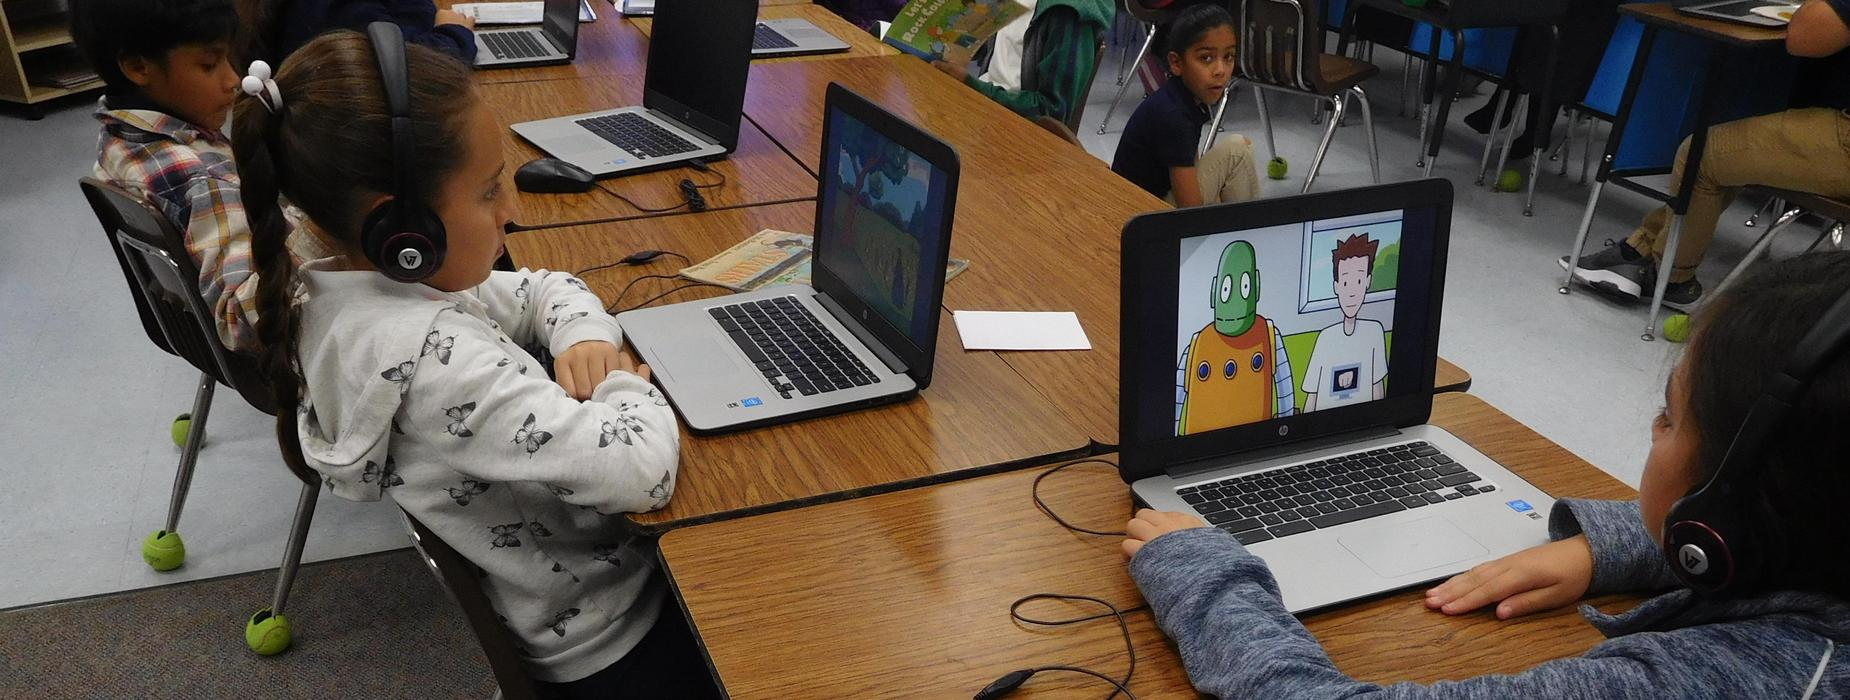 Individualized instruction through technology